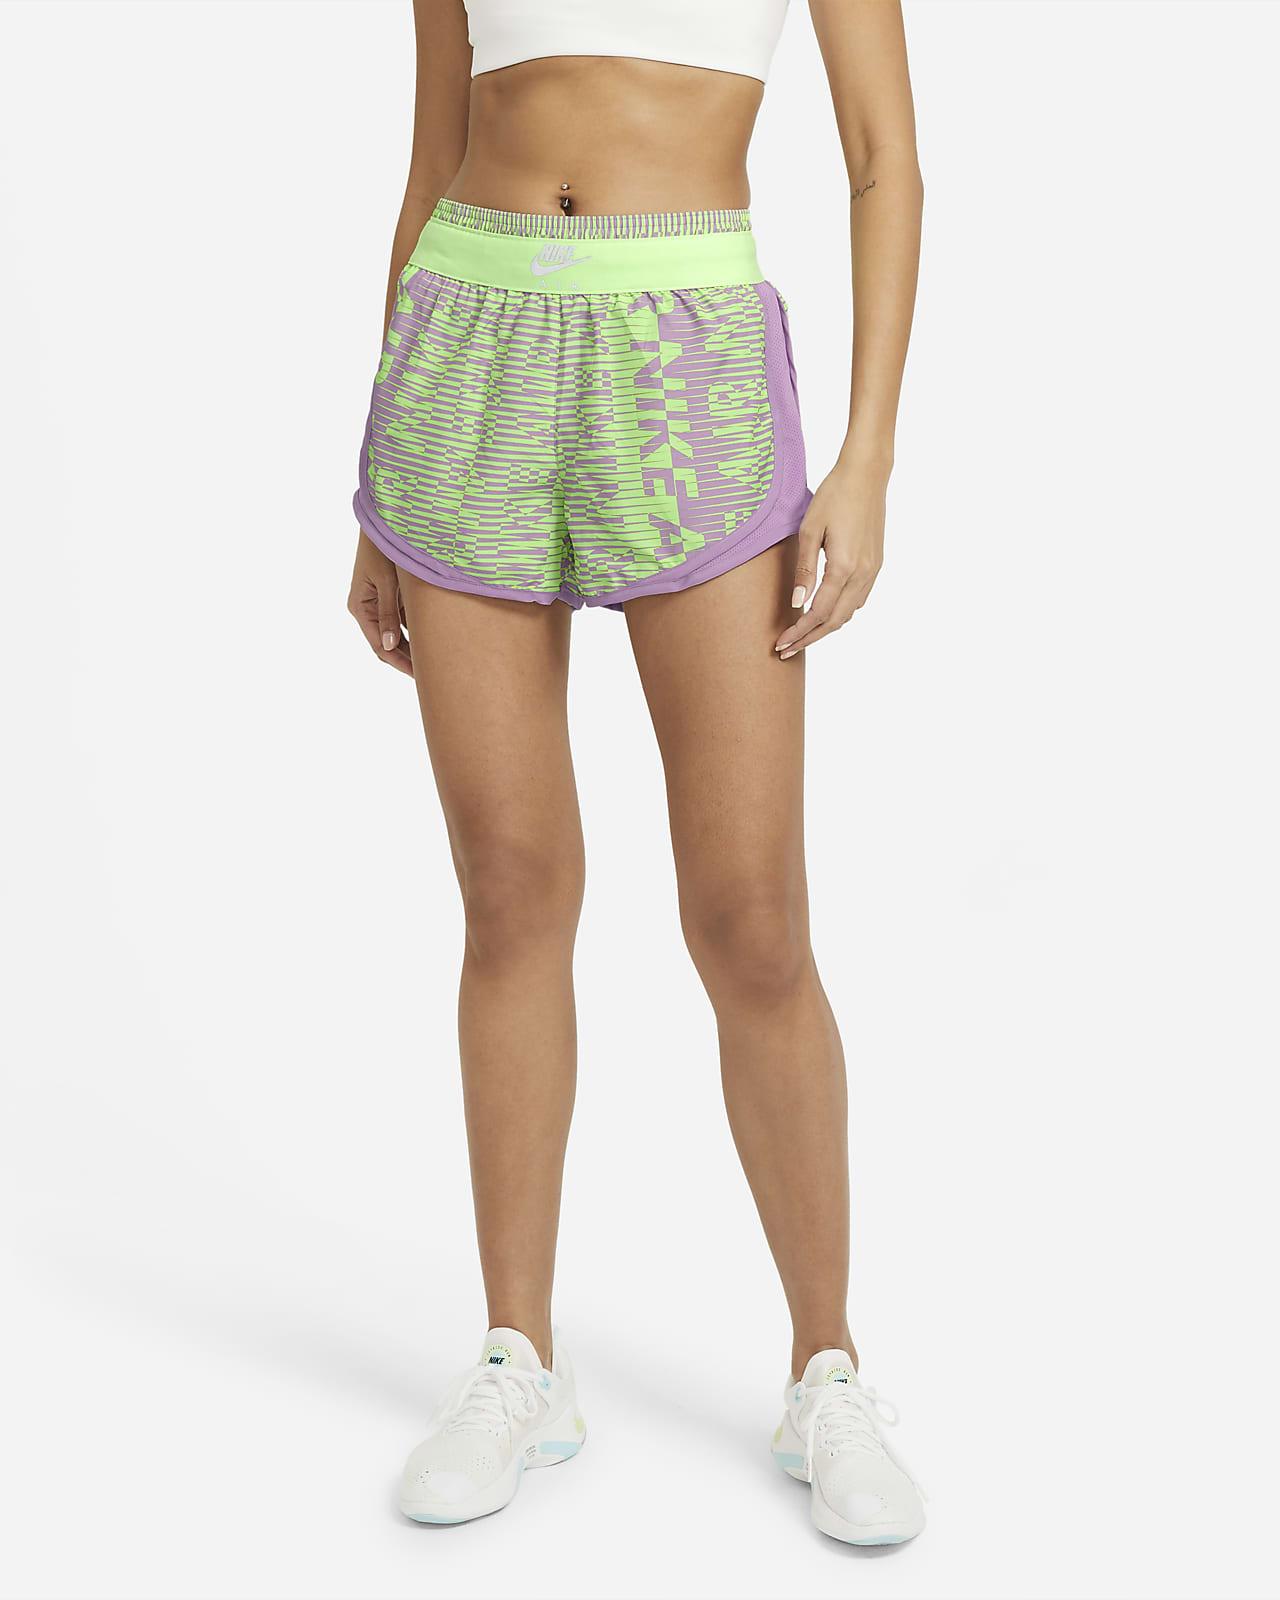 Nike Air Tempo Damen-Laufshorts mit Print